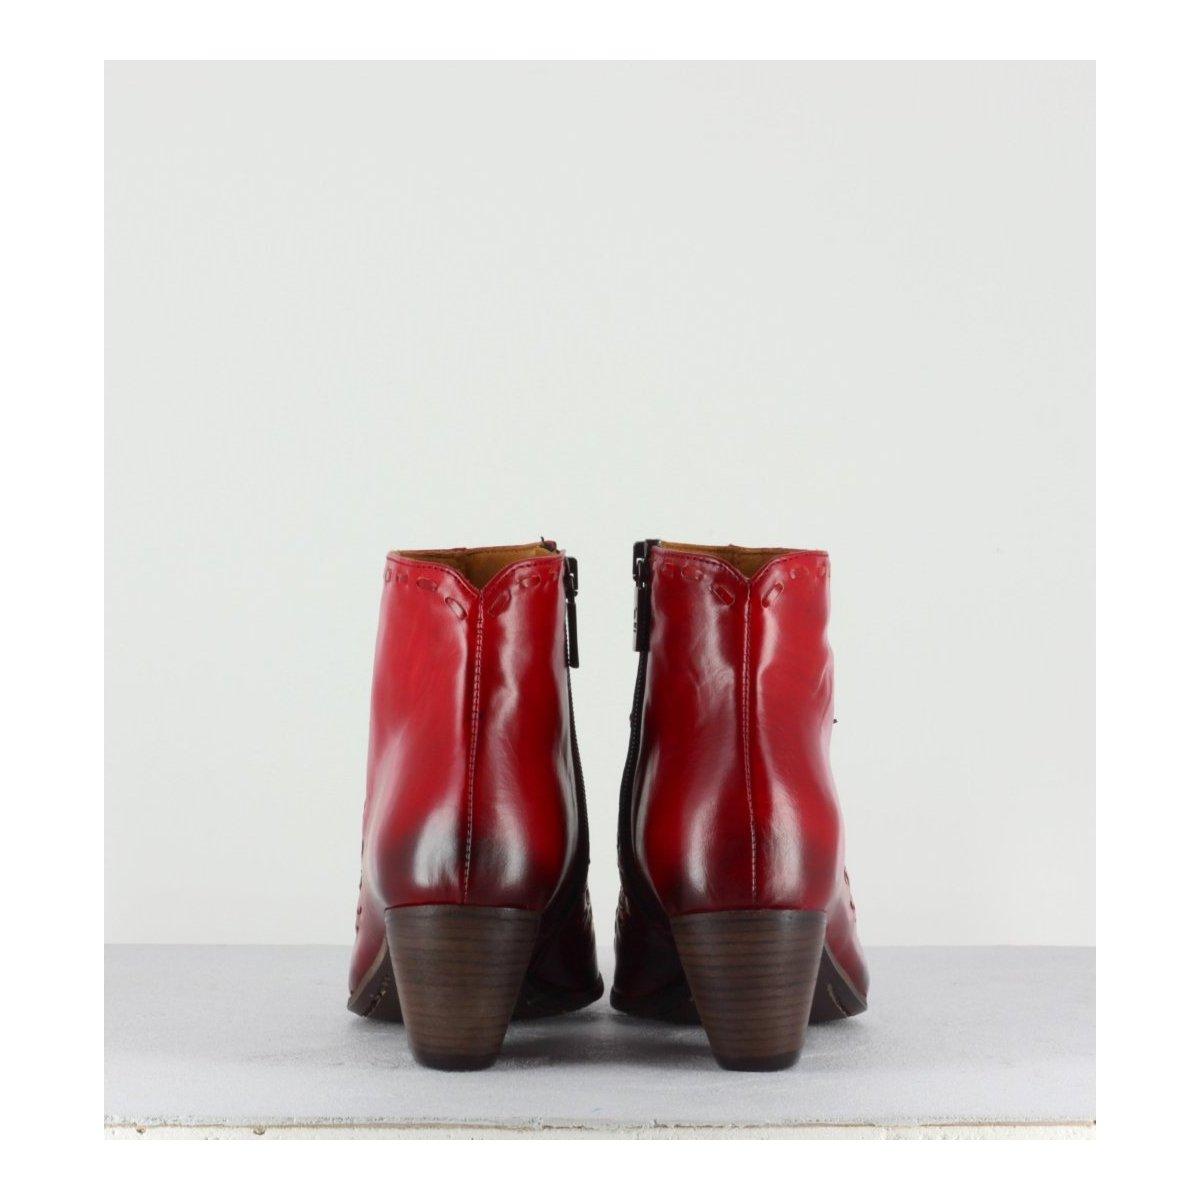 JO GHOST boots femme - 2276R